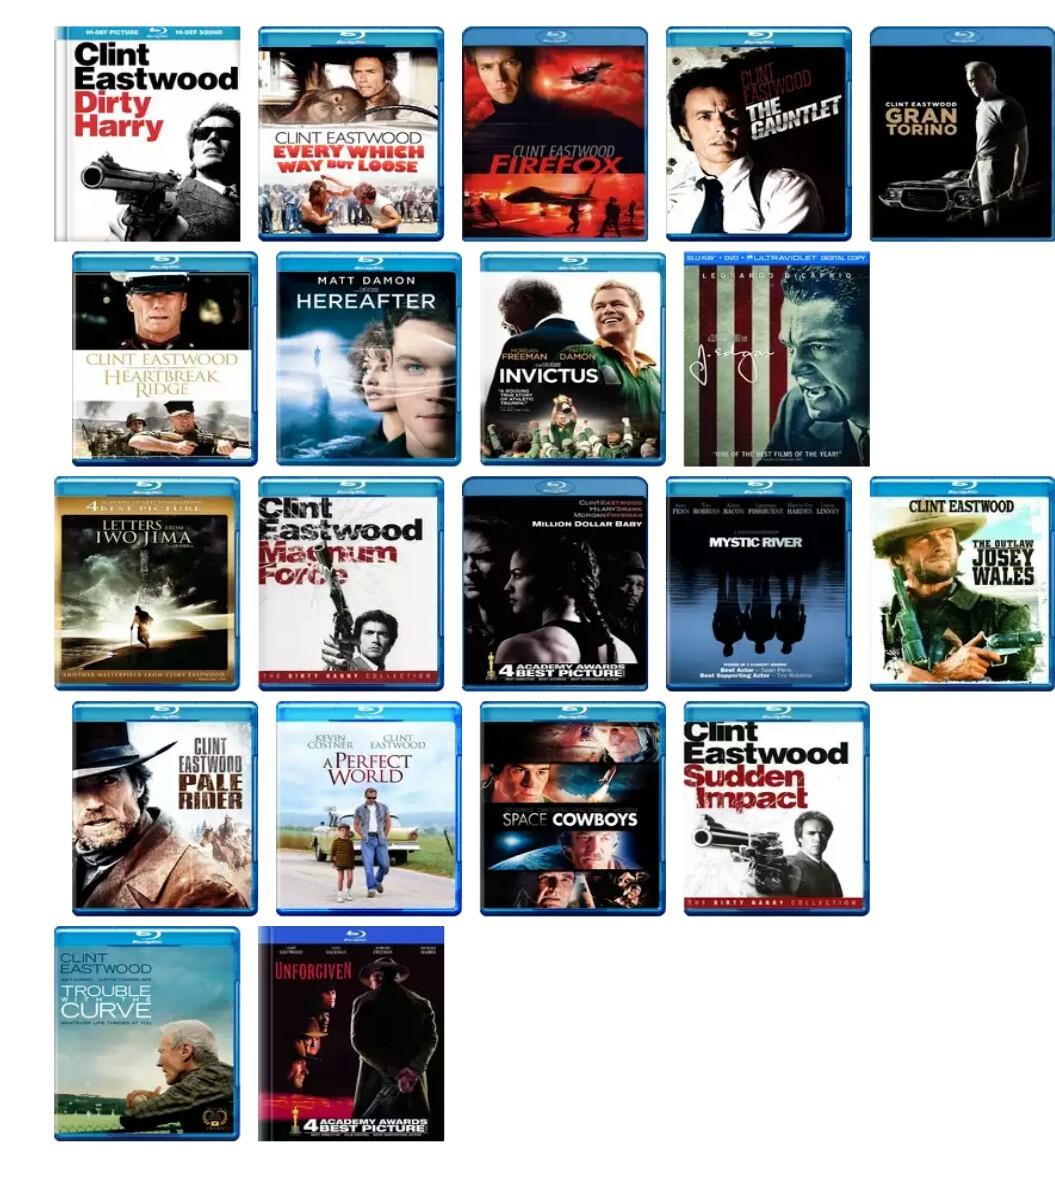 Colección 20 películas de Clint Eastwood en Amazon